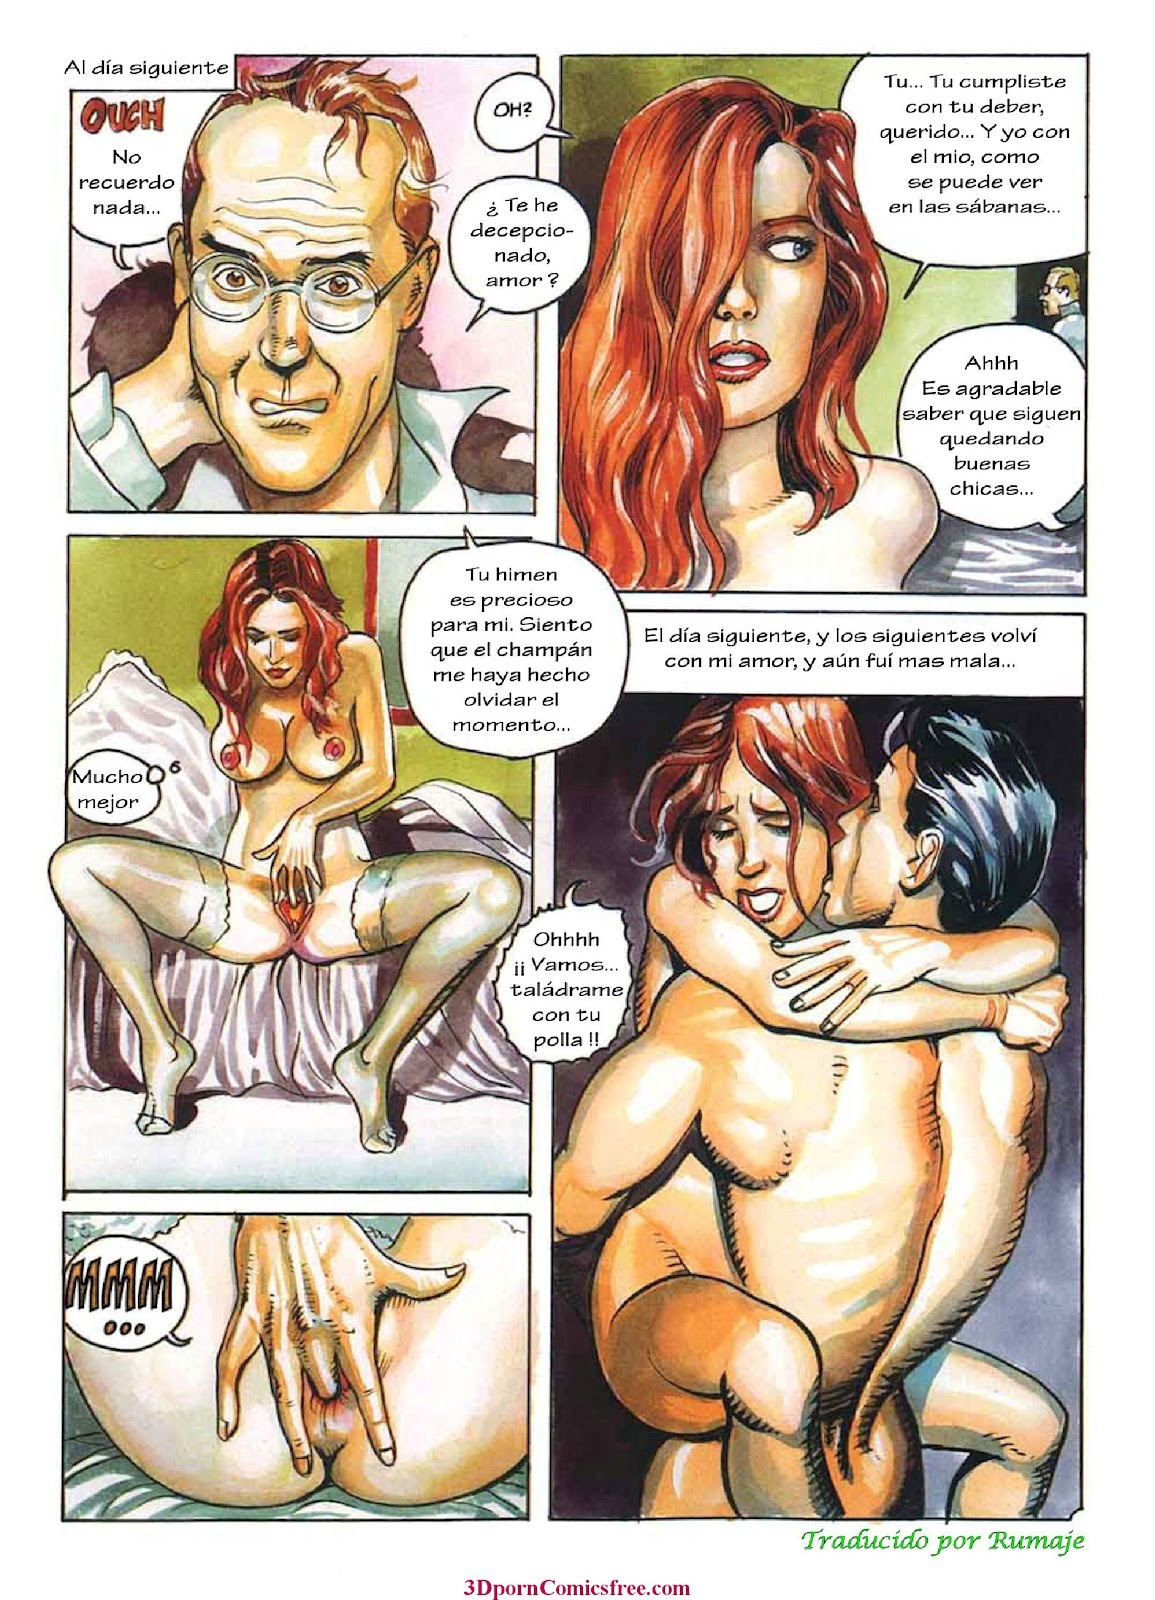 videos españoles porno gratis mamadas porno